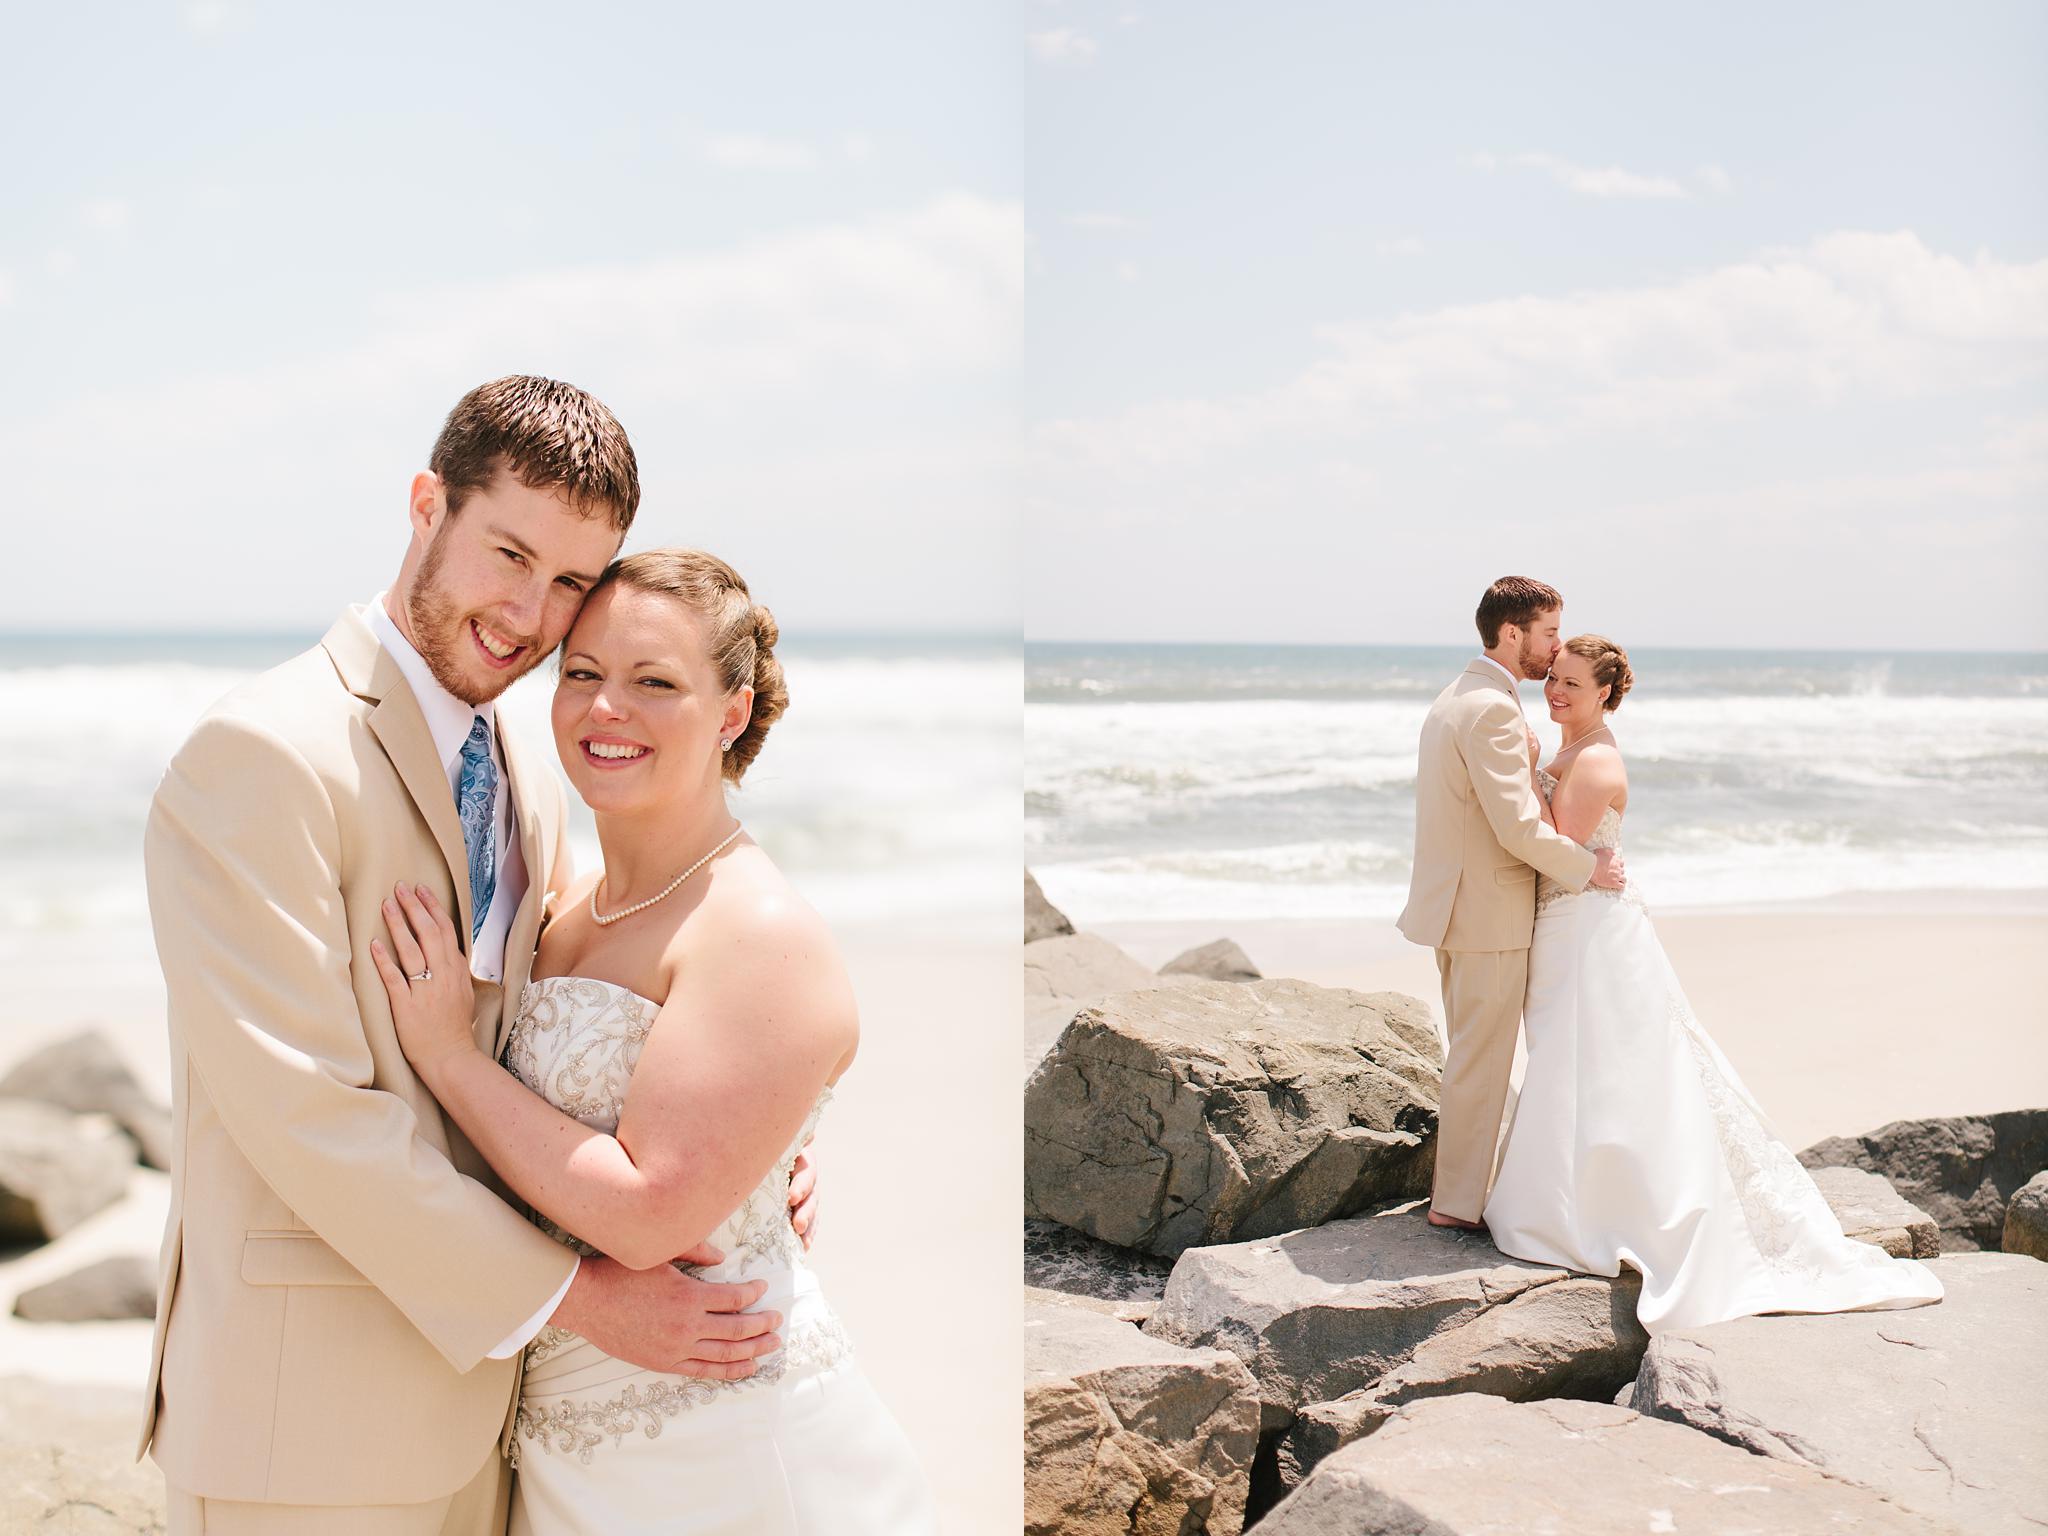 brant_beach_yacht_club_wedding_long_beach_island_nj_wedding_photographer_114.jpg